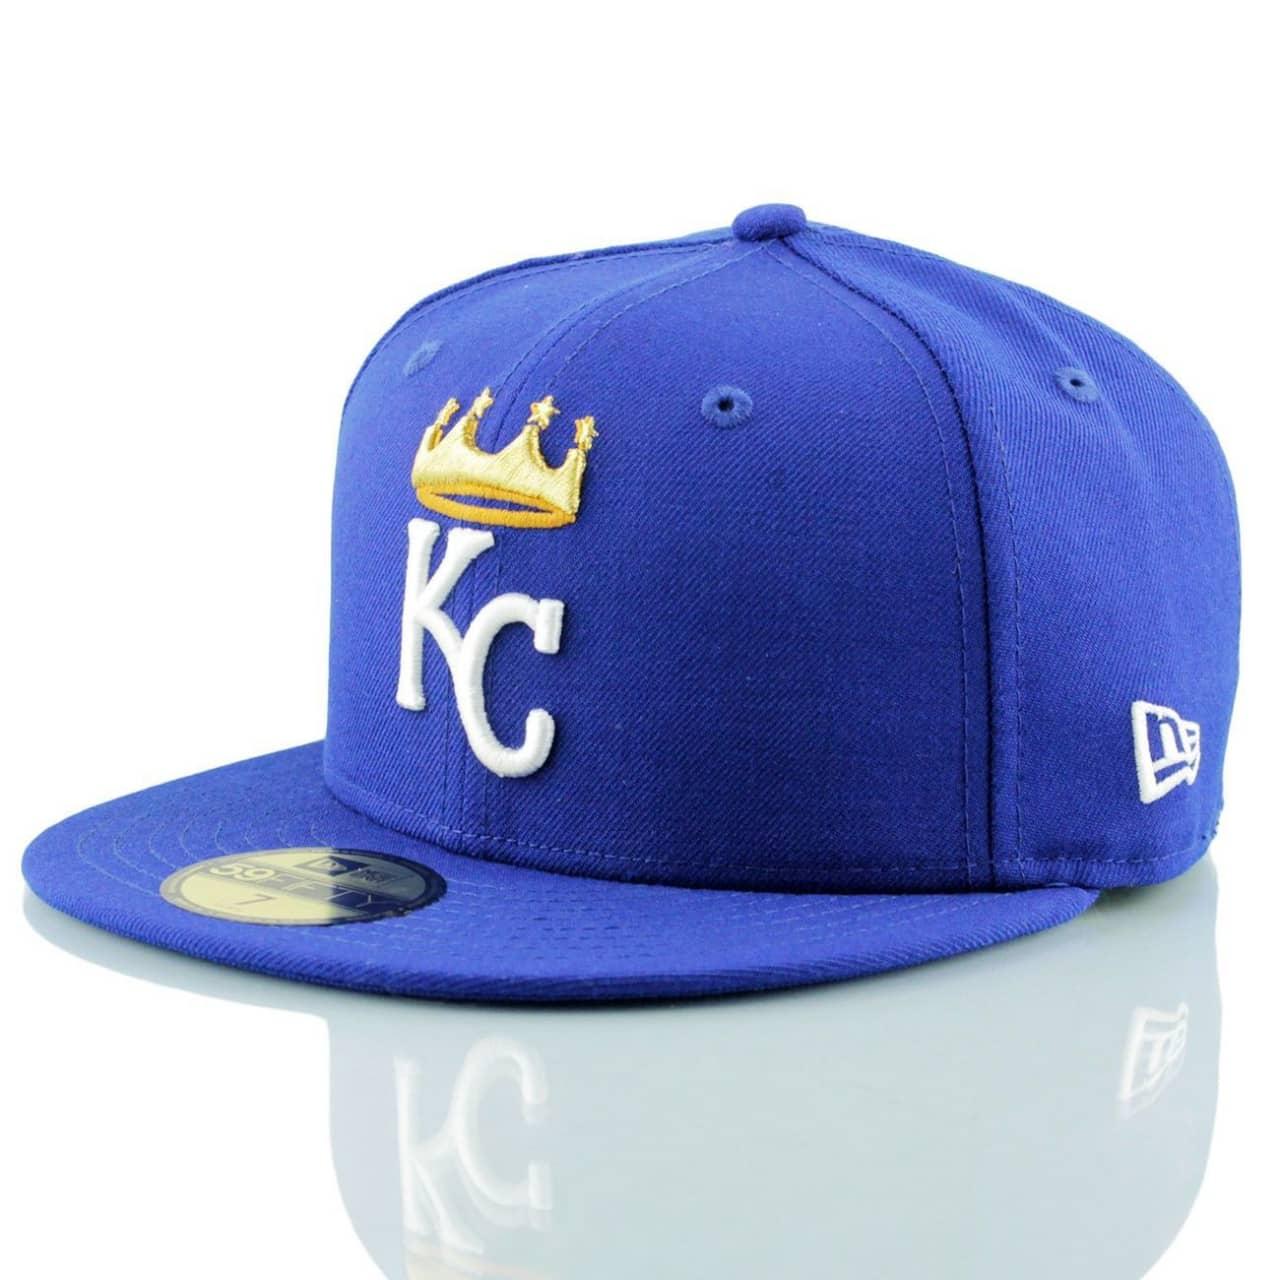 1b195333e4f New Era Kansas City Royals Crown Logo 59FIFTY Fitted MLB Cap